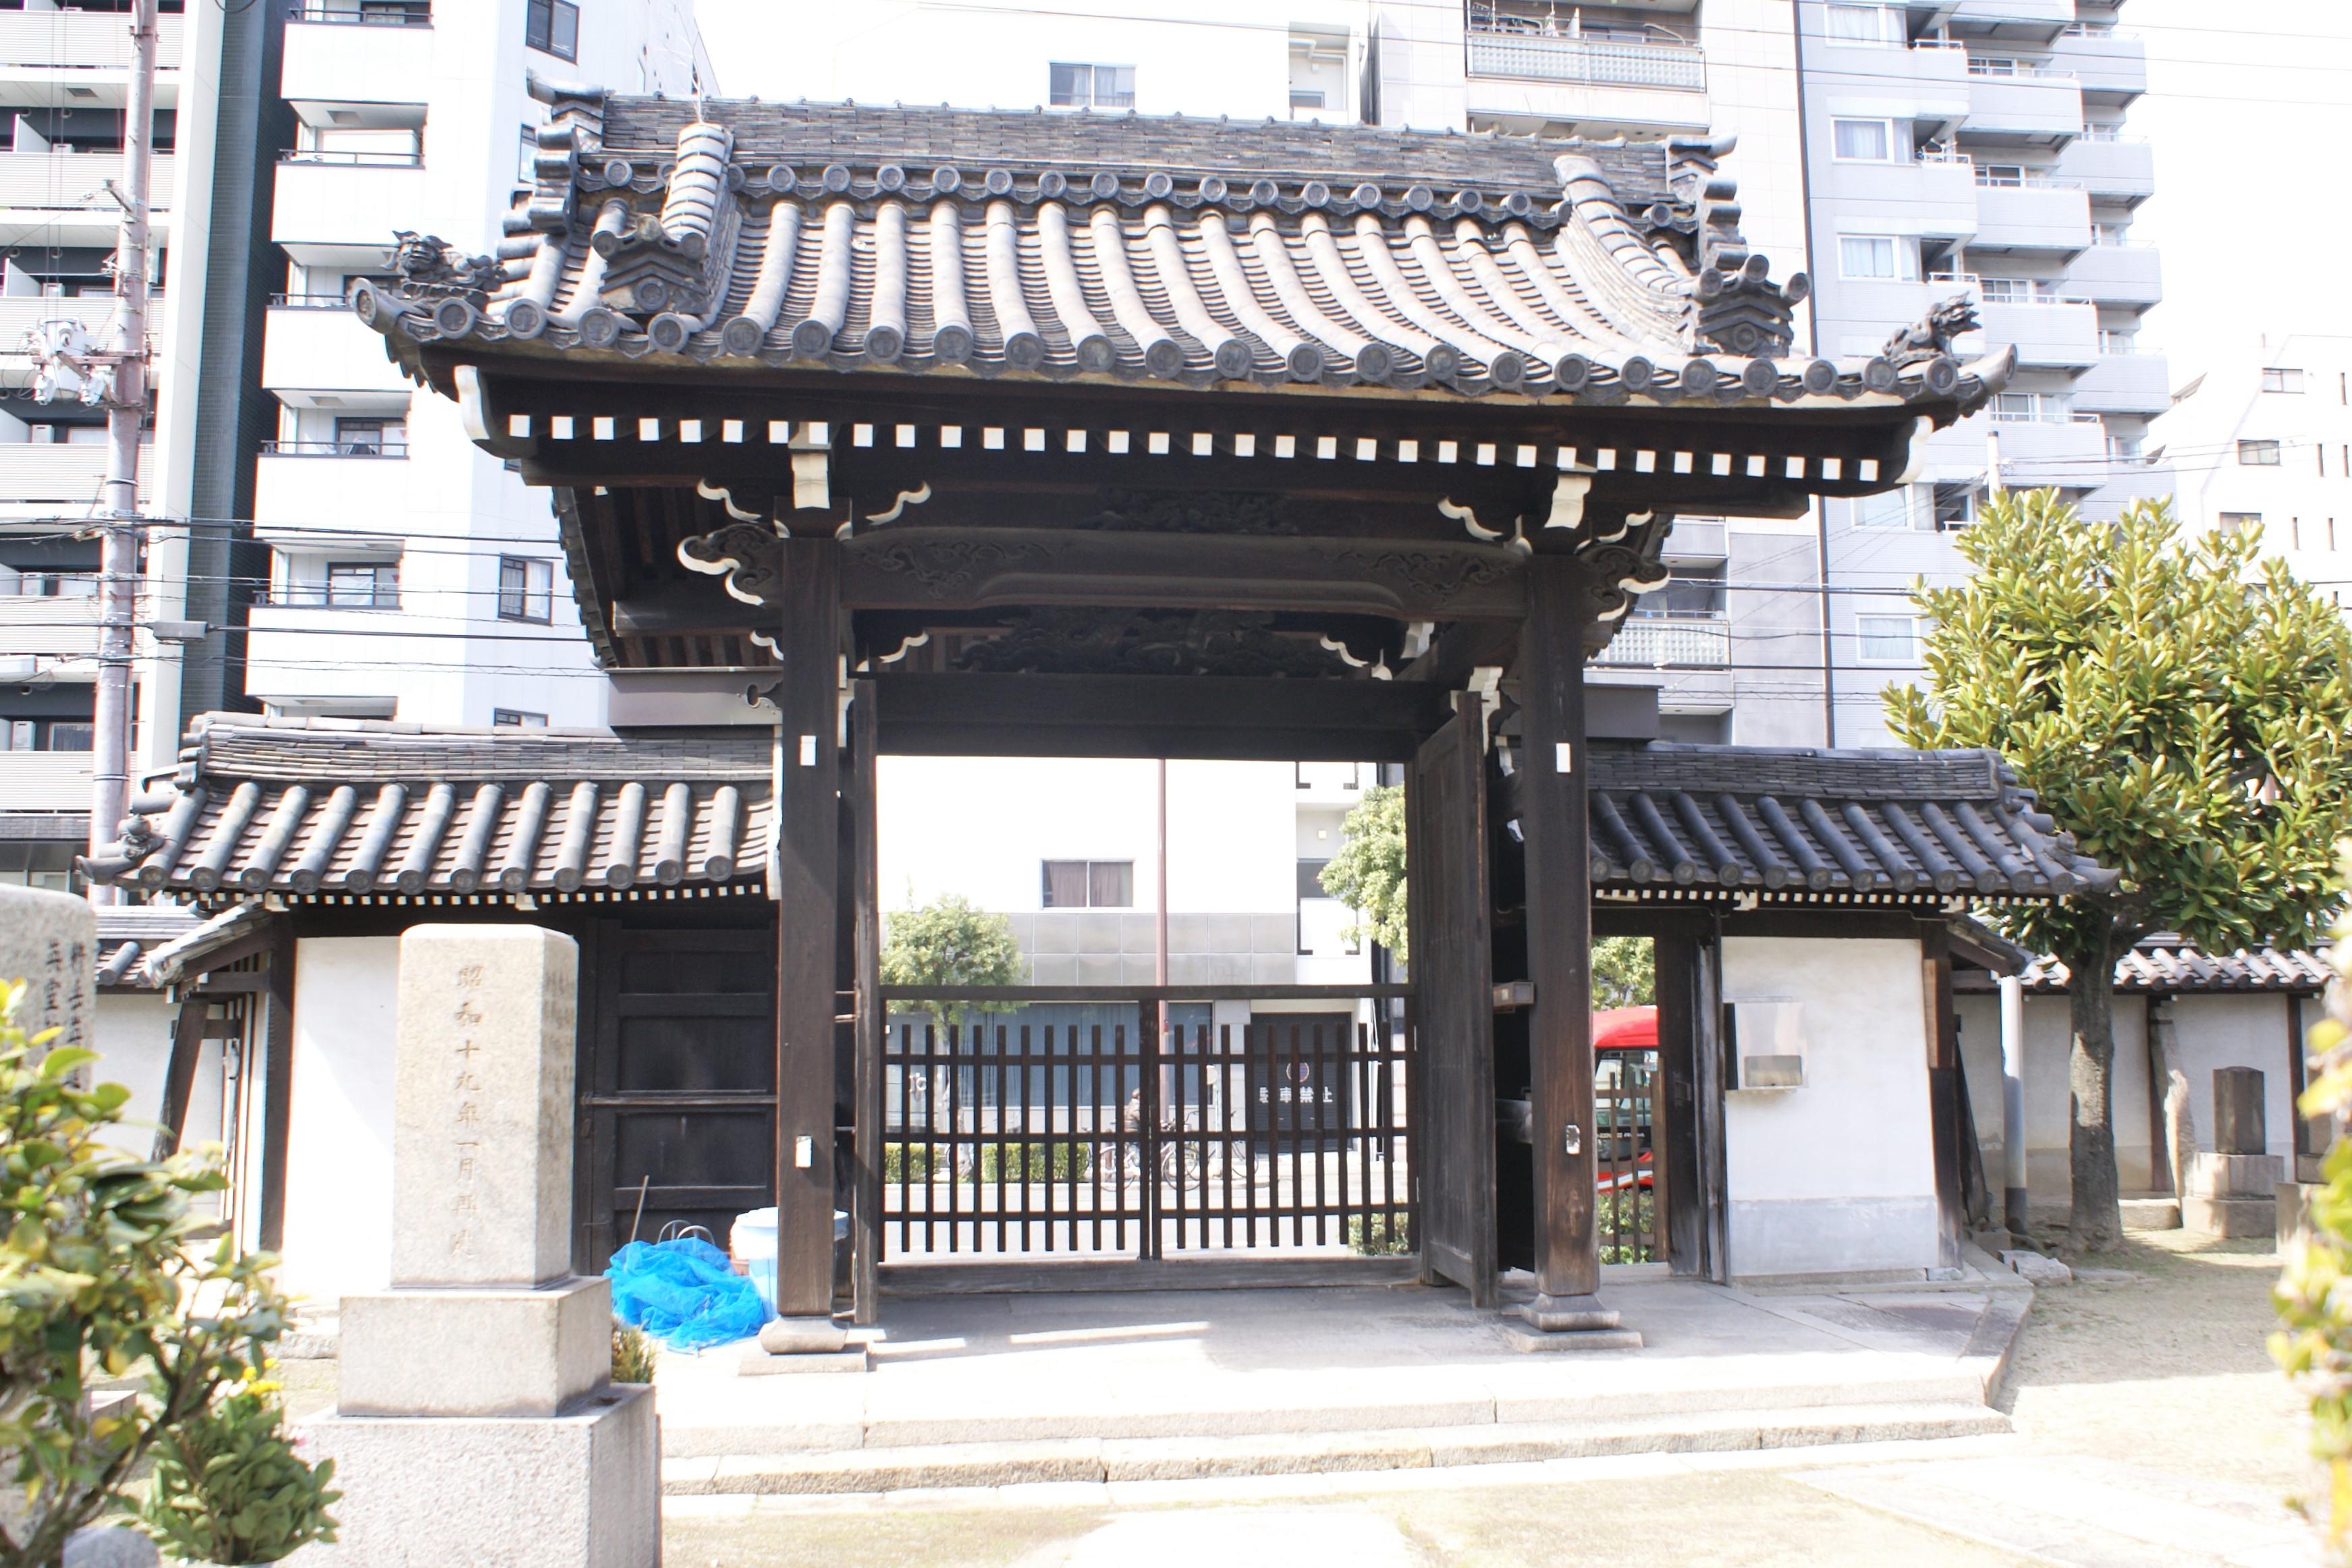 <p>境内内部から山門を見る。</p>各部位の彫刻、3か所の本瓦屋根の意匠の異なる飾り瓦や繁垂木が端正な美しさを醸しだしている。